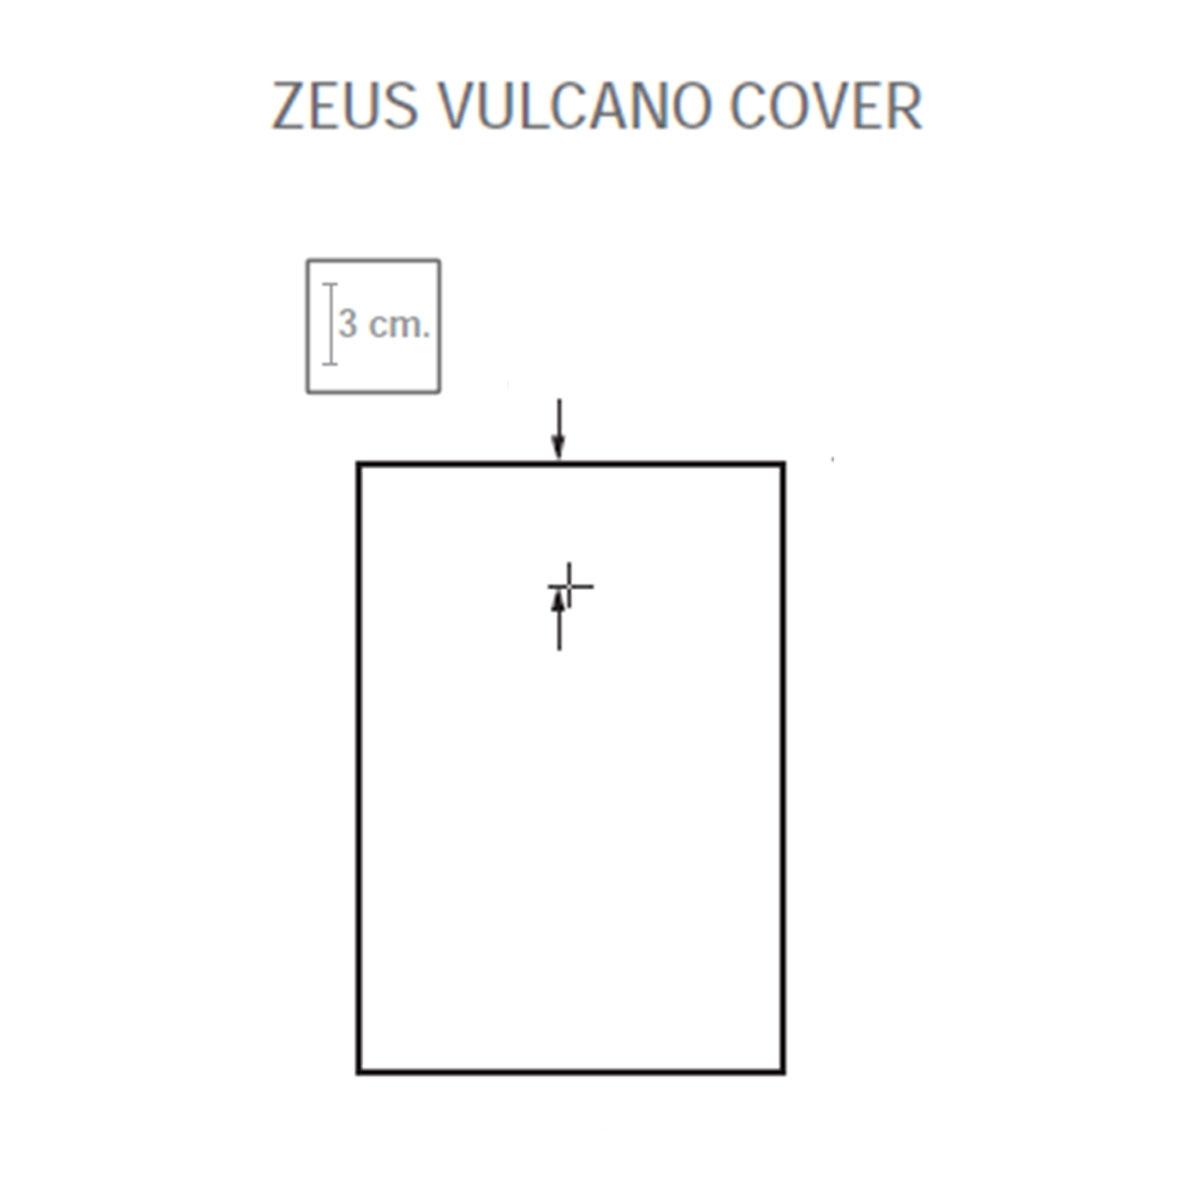 Plato de ducha rectangular 100x80 Zeus Vulcano Antracita